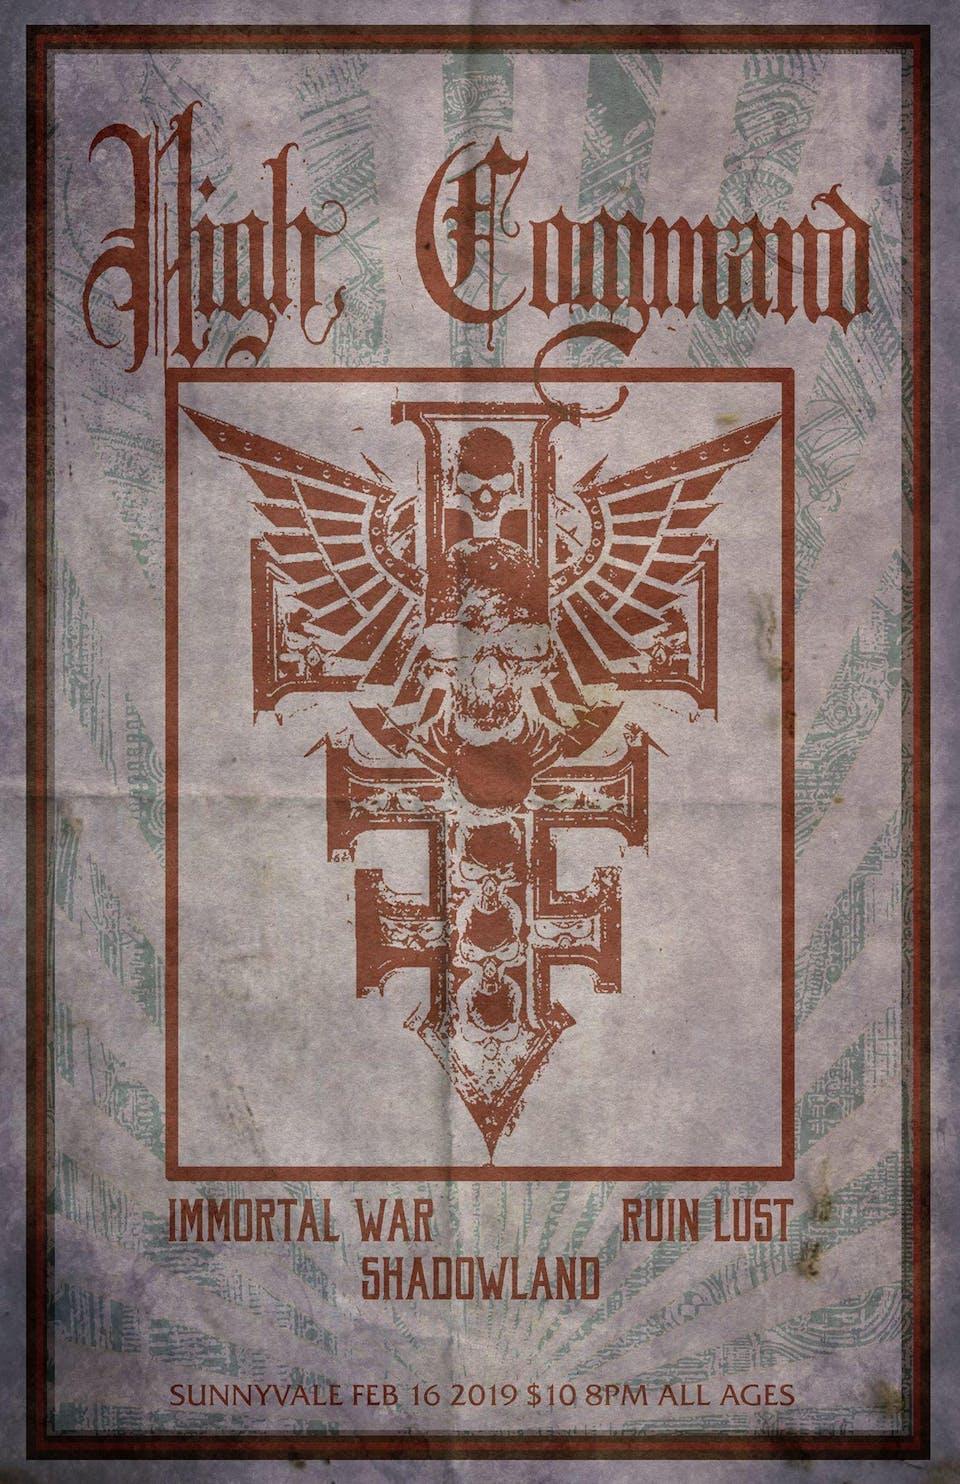 High Command / Immortal War / Ruin Lust / Shadowland